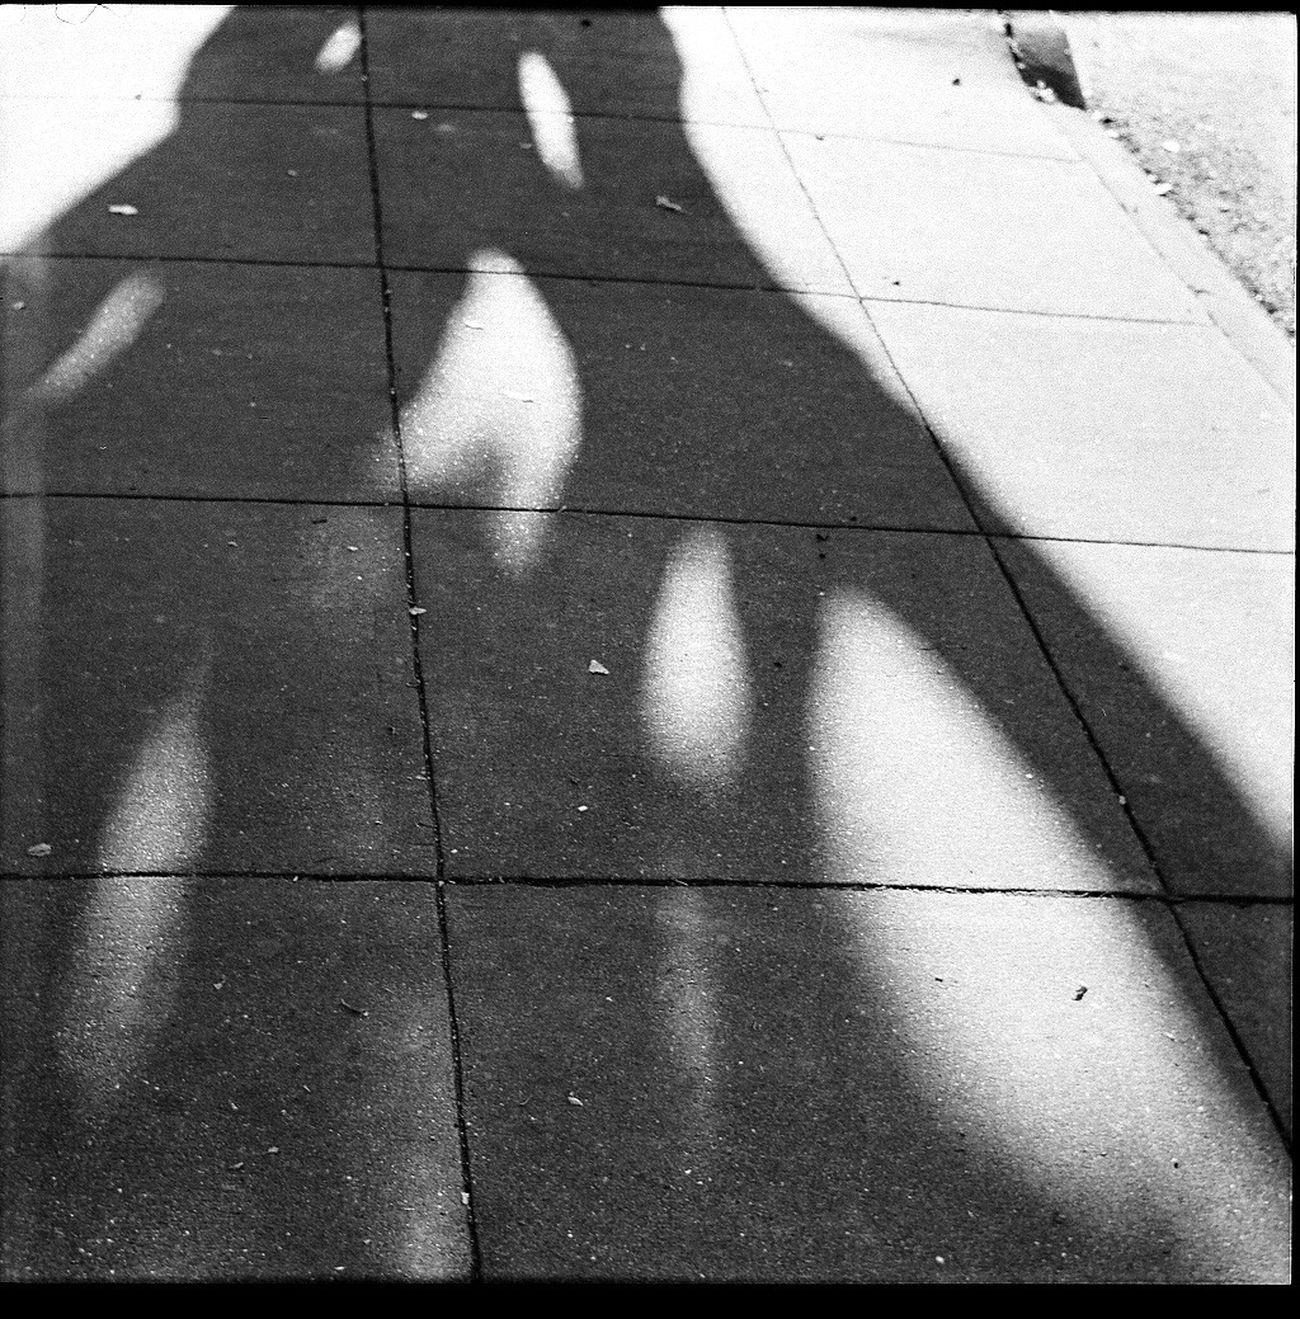 Shadow Film Blk N Wht Square 6x6 Koduckgirl Belair Panorama